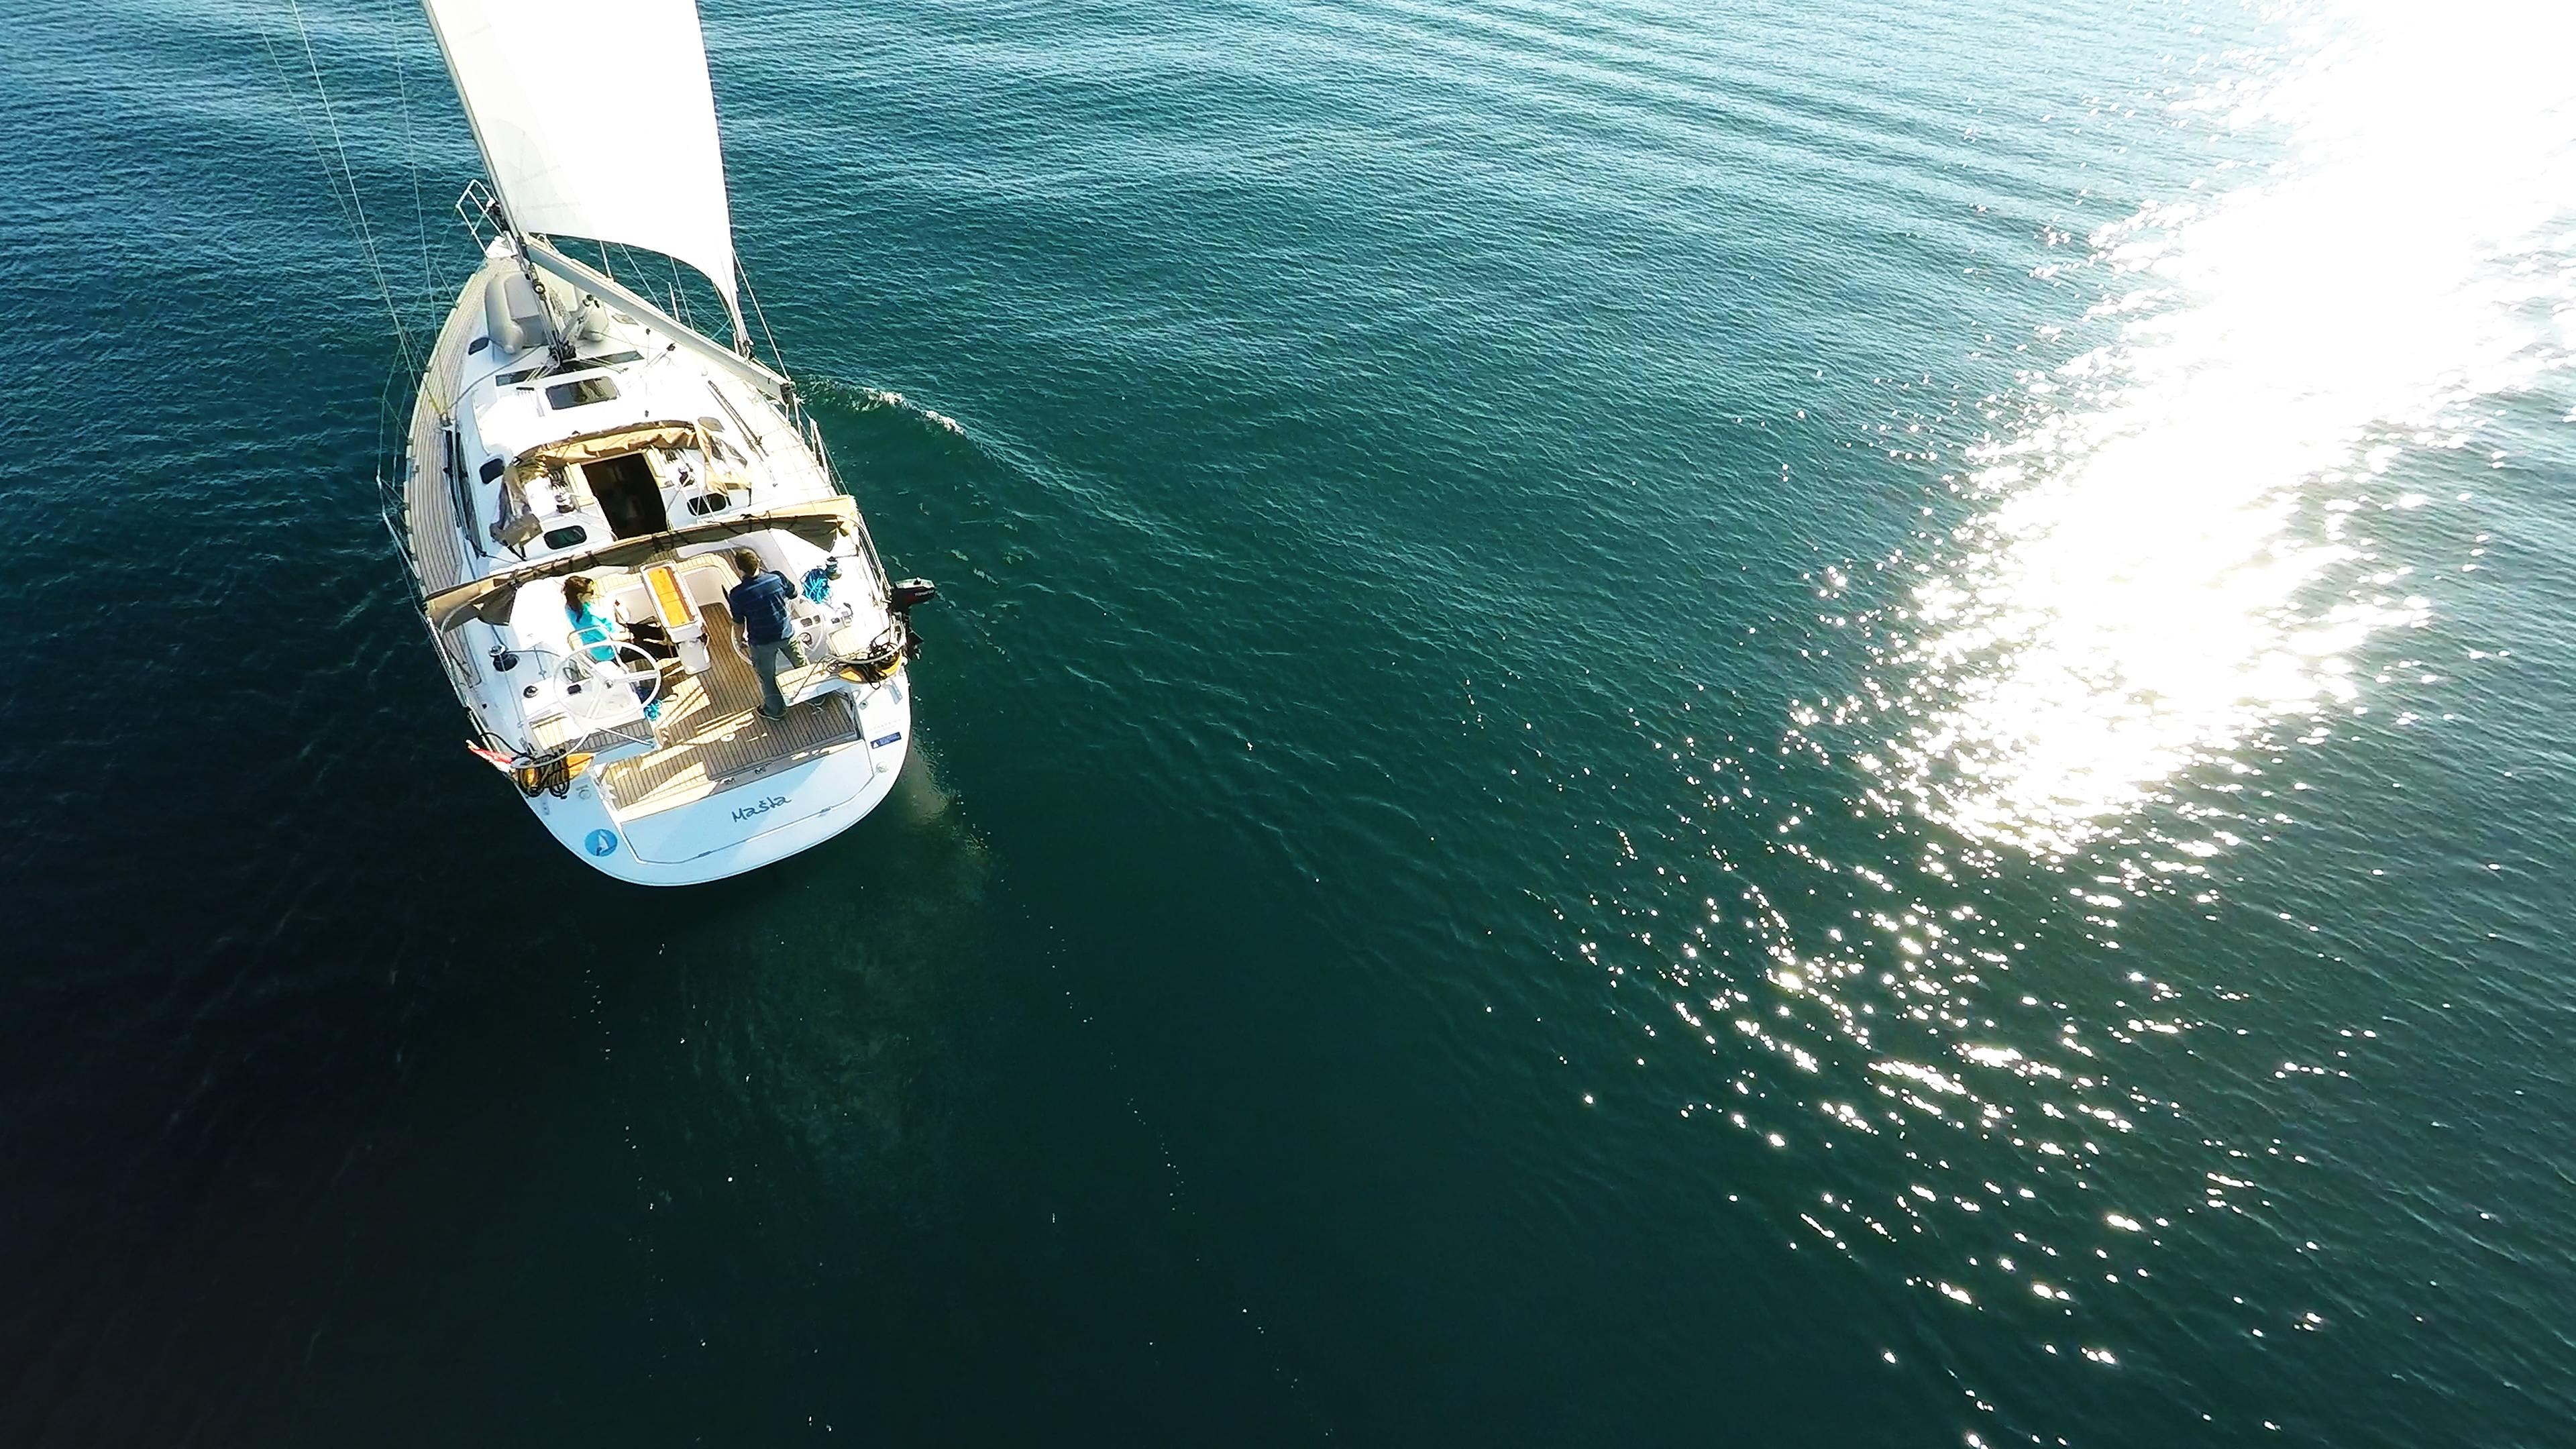 barcha a vela soleggiato riflesso del sole mare barca a vela elan 45 impression vela yacht a vela